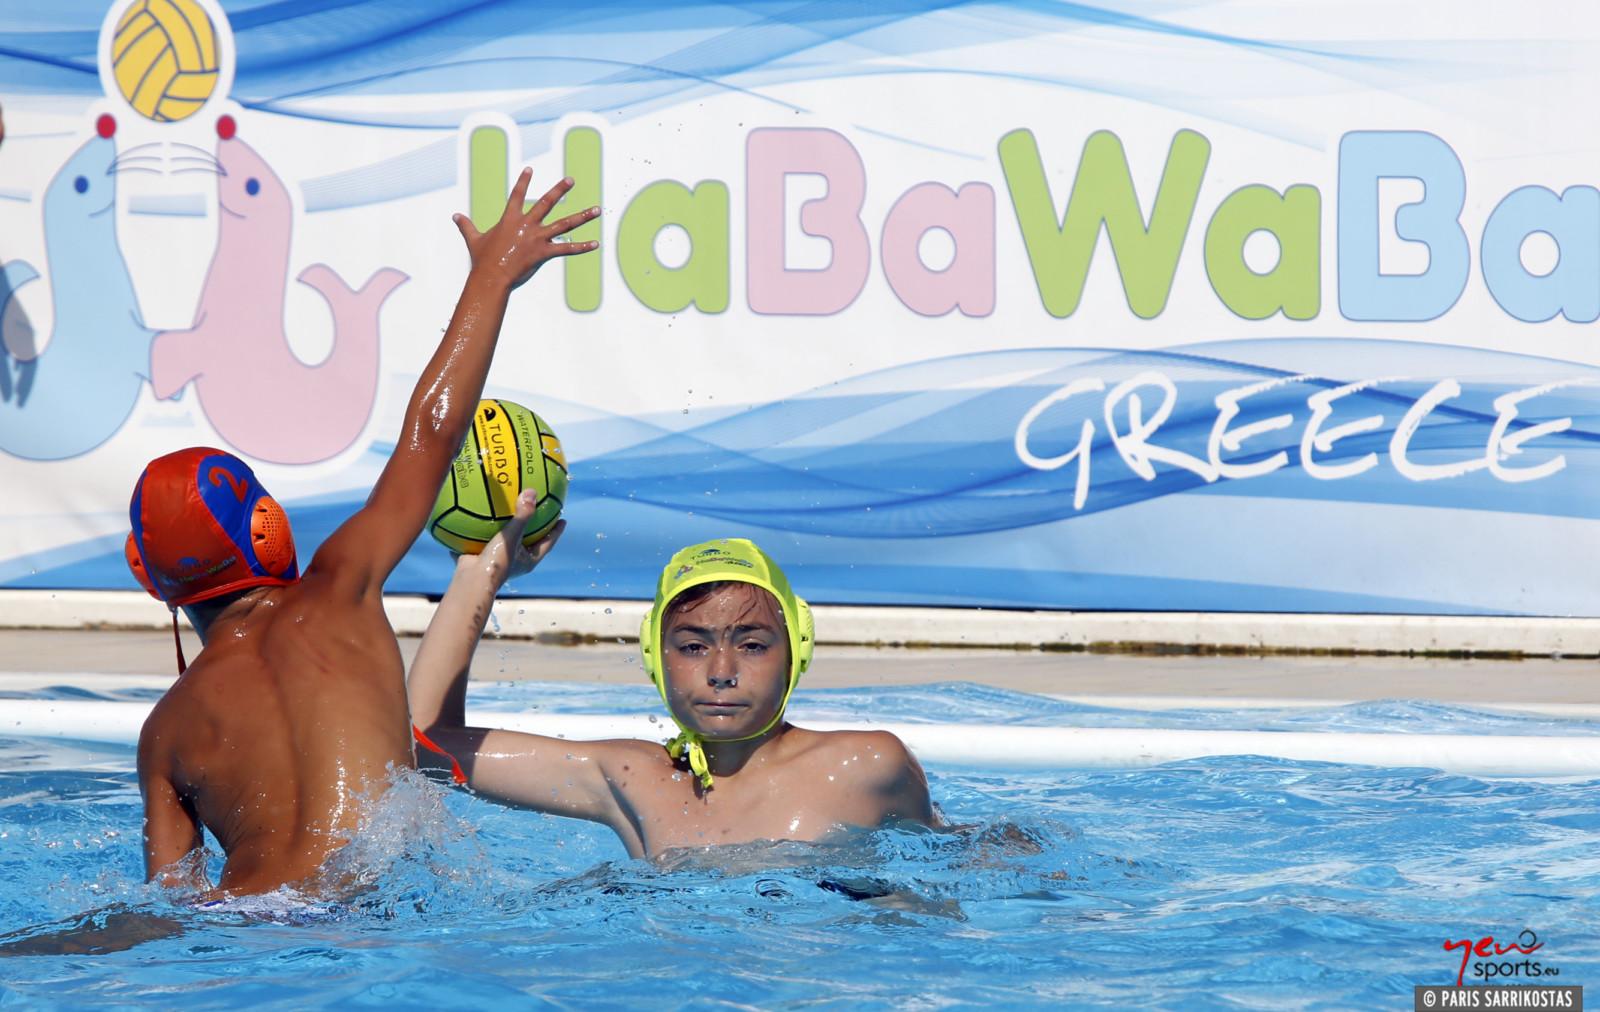 HaBaWaBa Greece continua a crescere